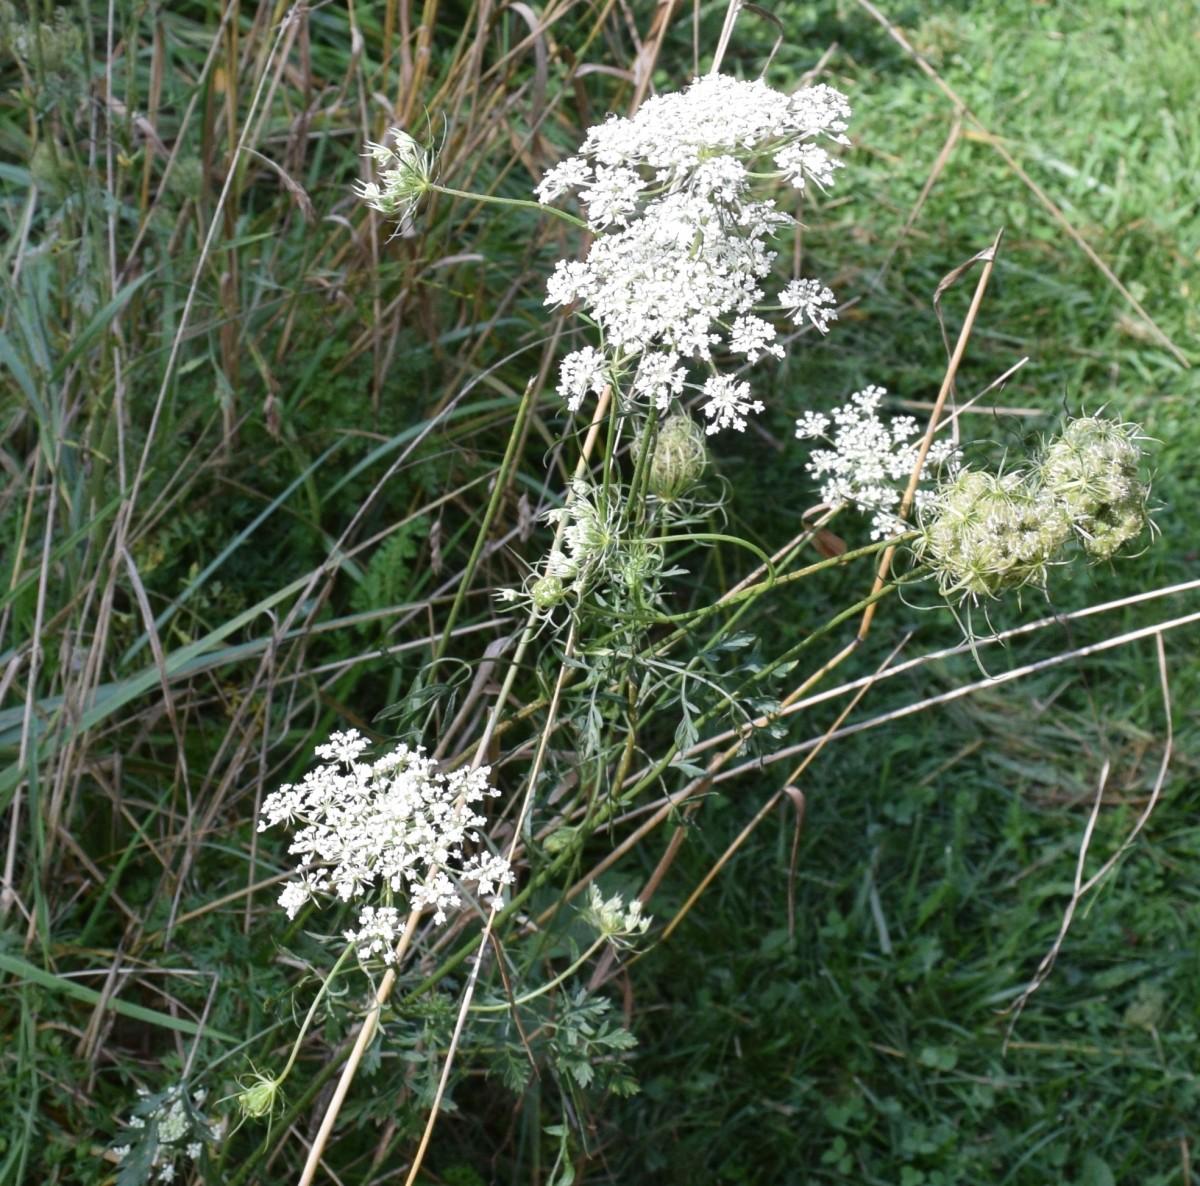 Wildflower: Queen Ann's Lace